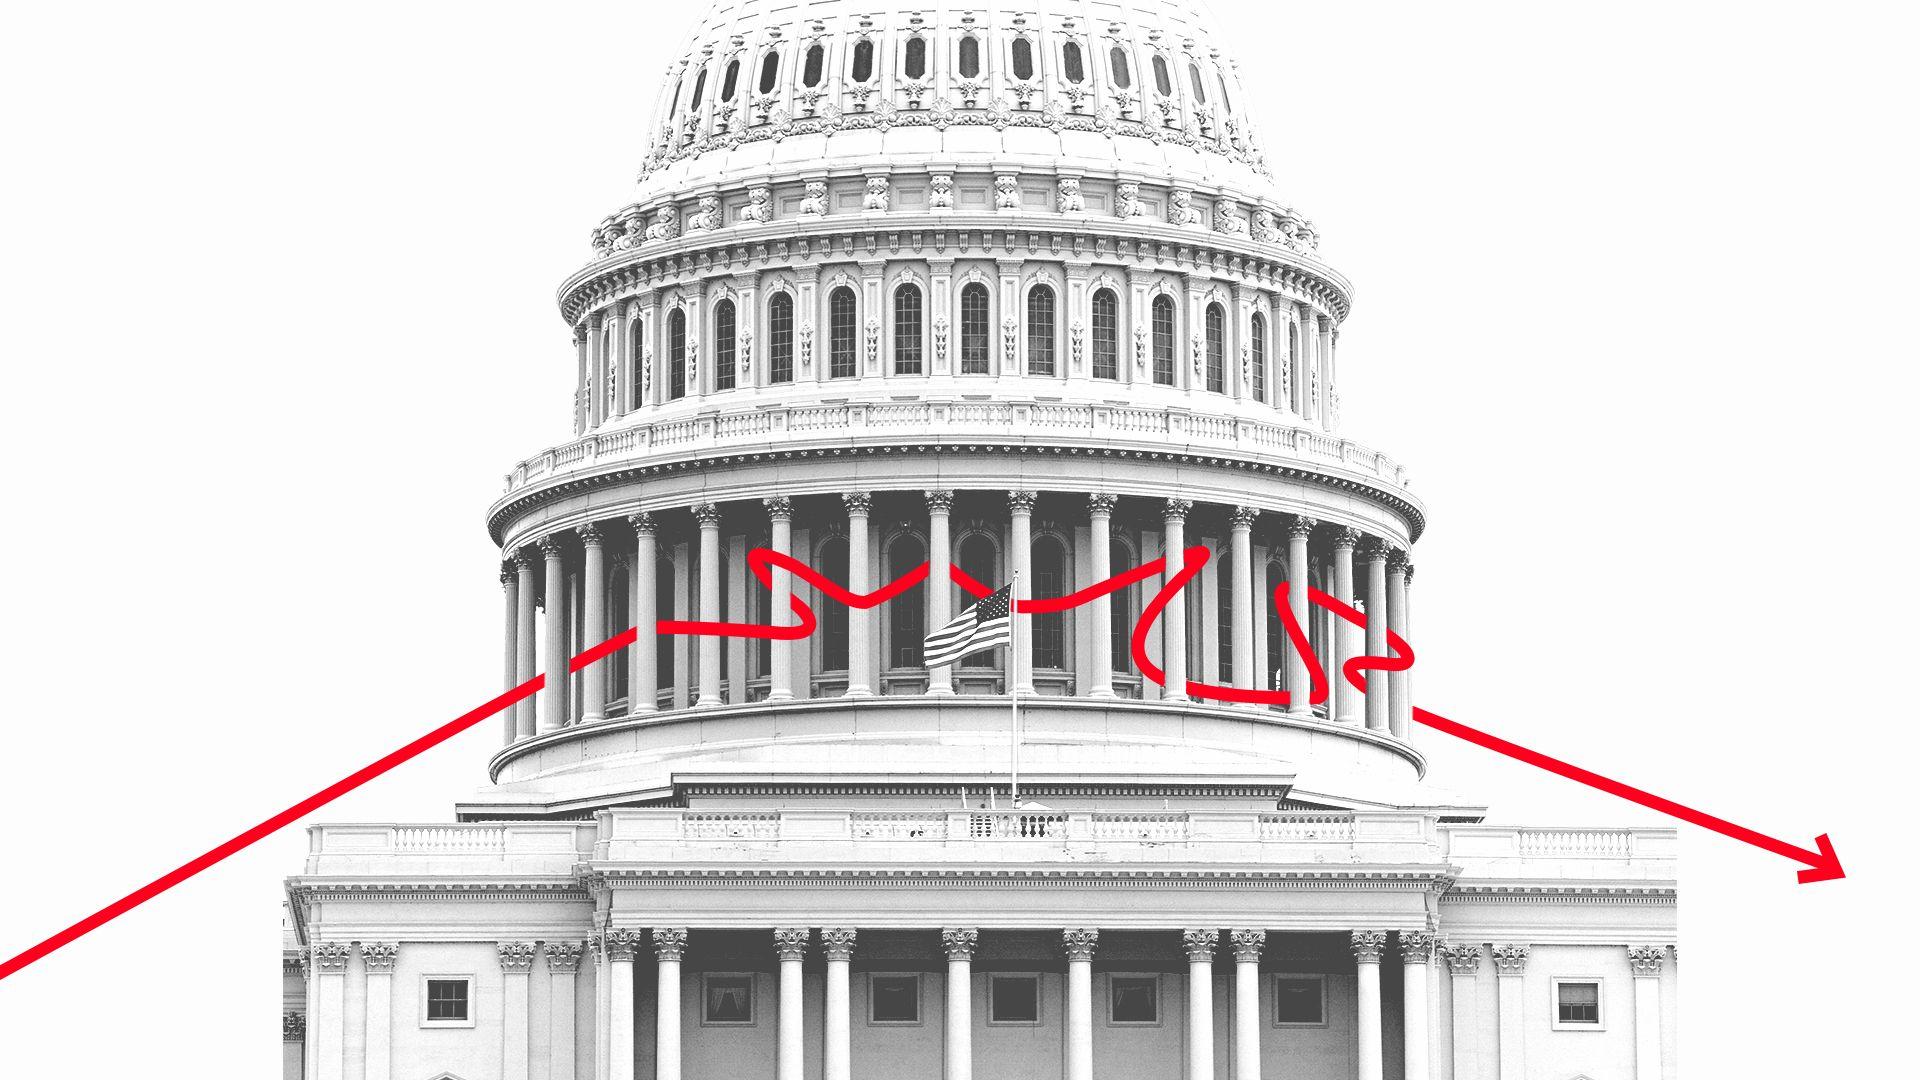 Illustration of trend line tangled in U.S. capital building.